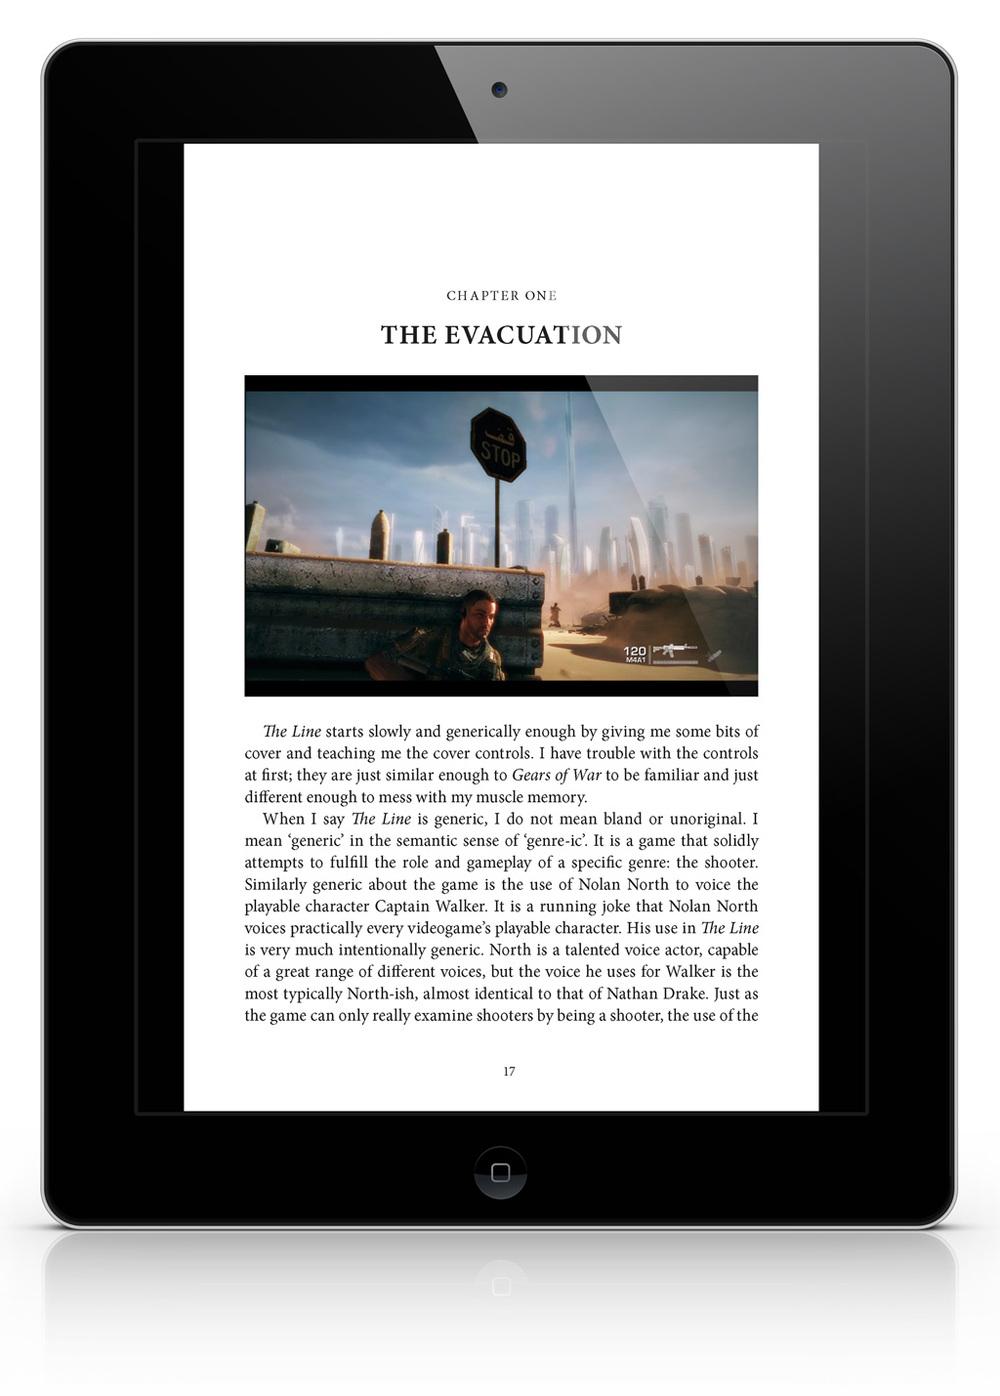 iPad-Retina-Display-Mockup1.jpg